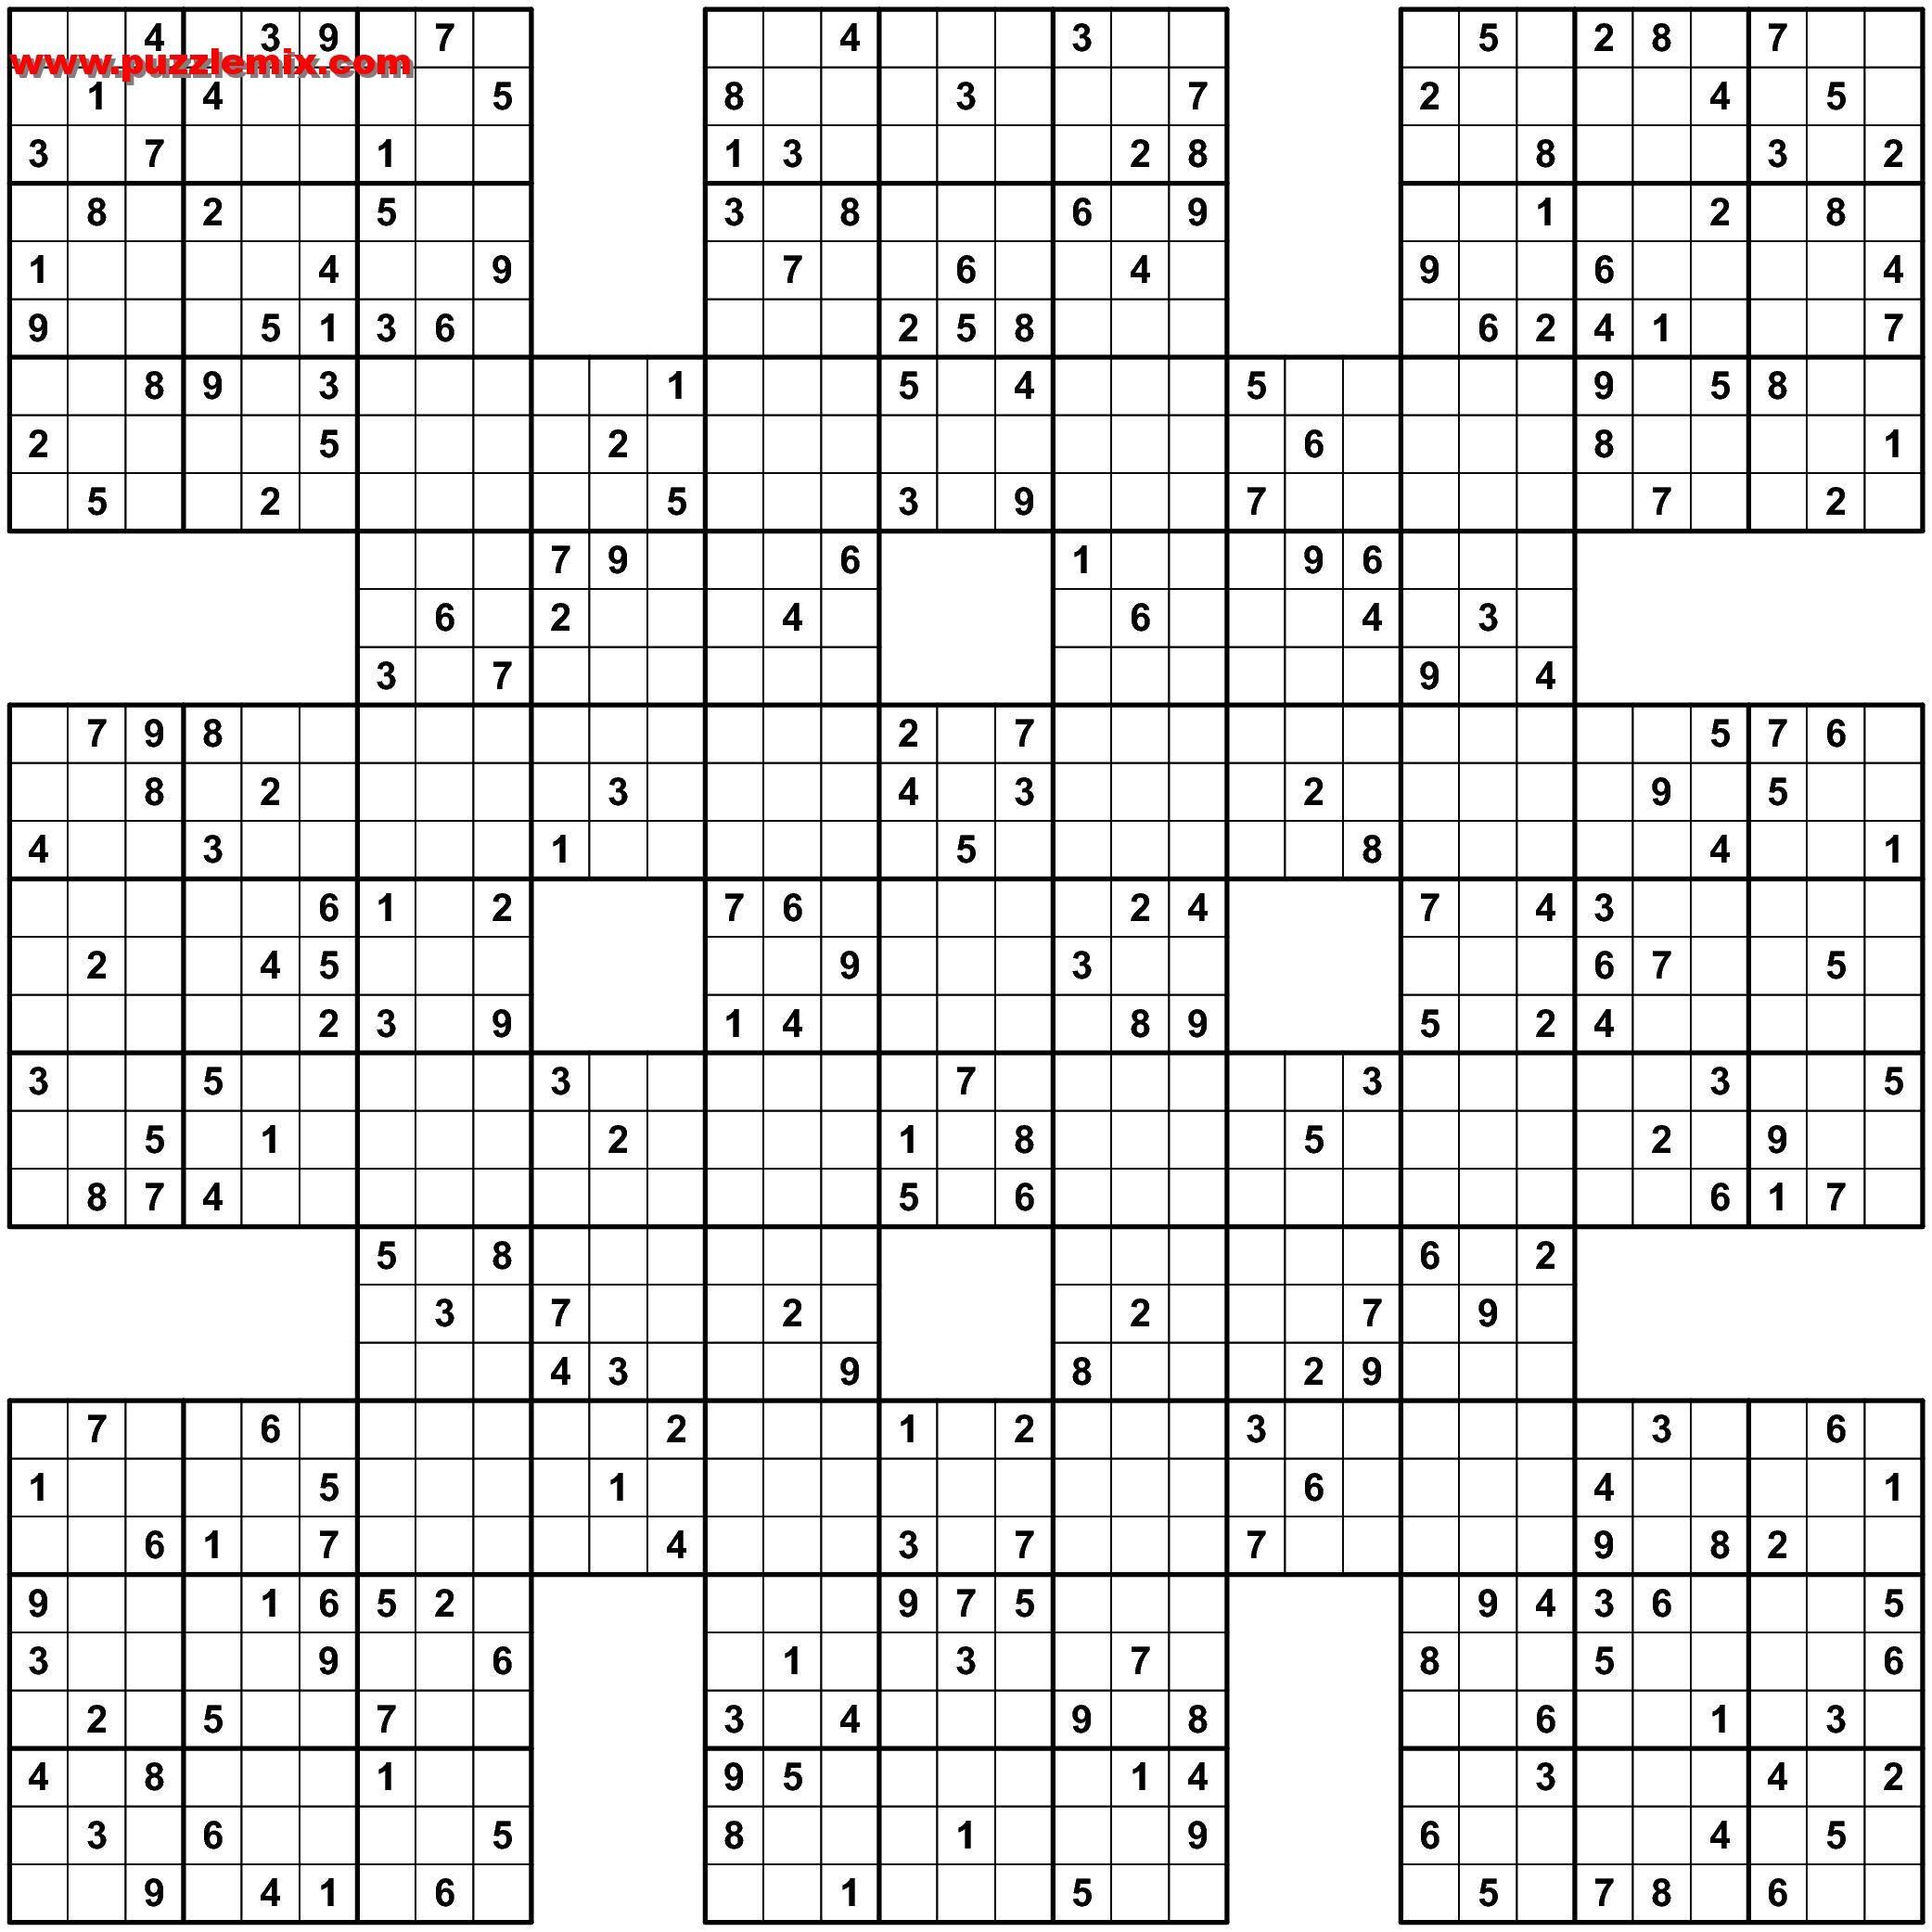 Pindiane Shepard On 13Grid 1 | Pinterest | Sudoku Puzzles, Word - Sudoku 16X16 Printable Free